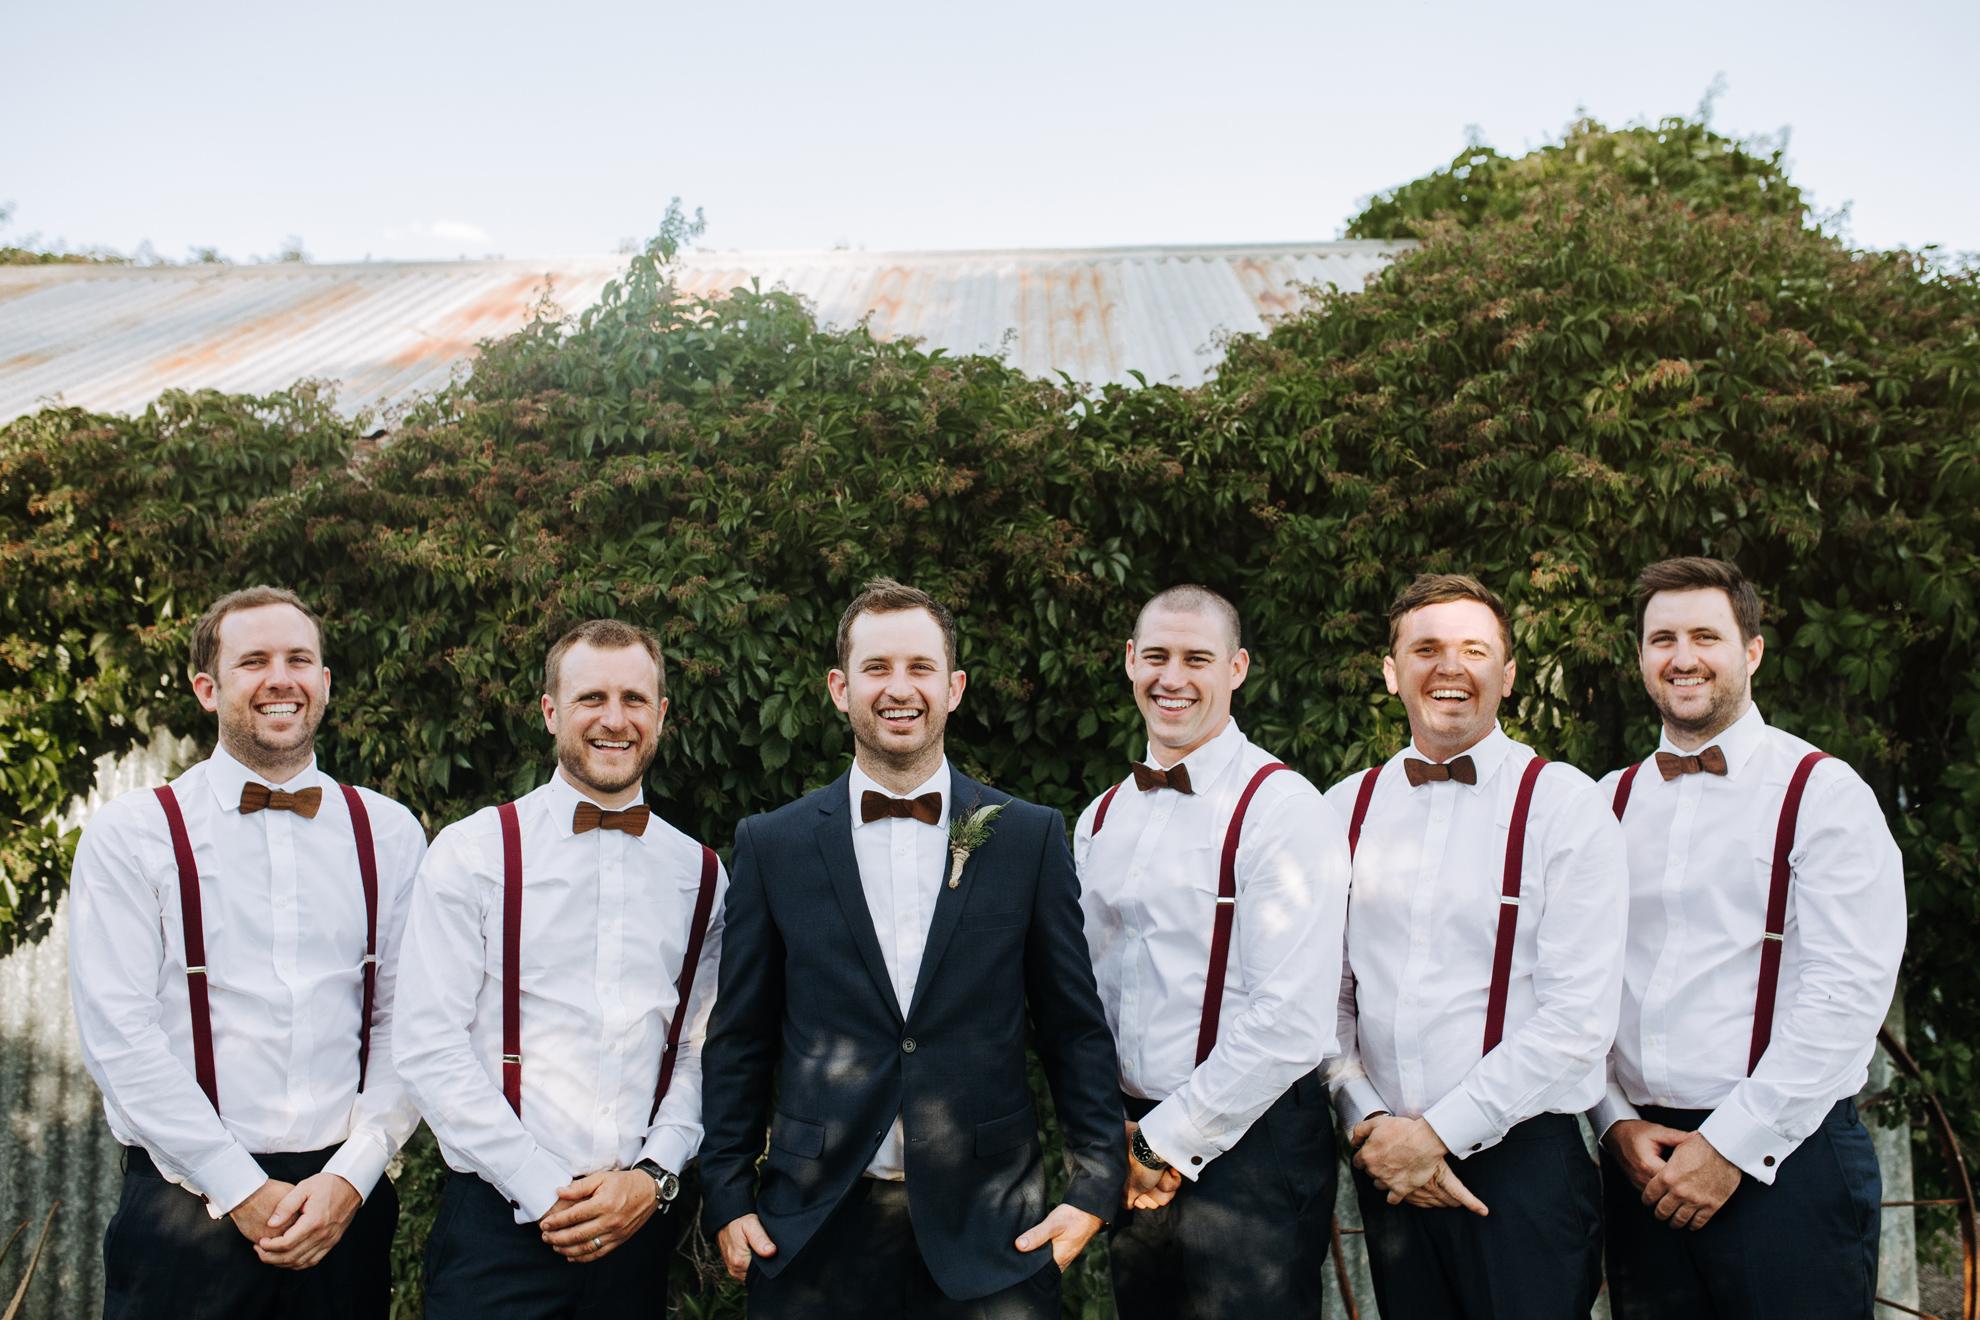 054-Jason_Jessie_Dalby_Country_Wedding.jpg